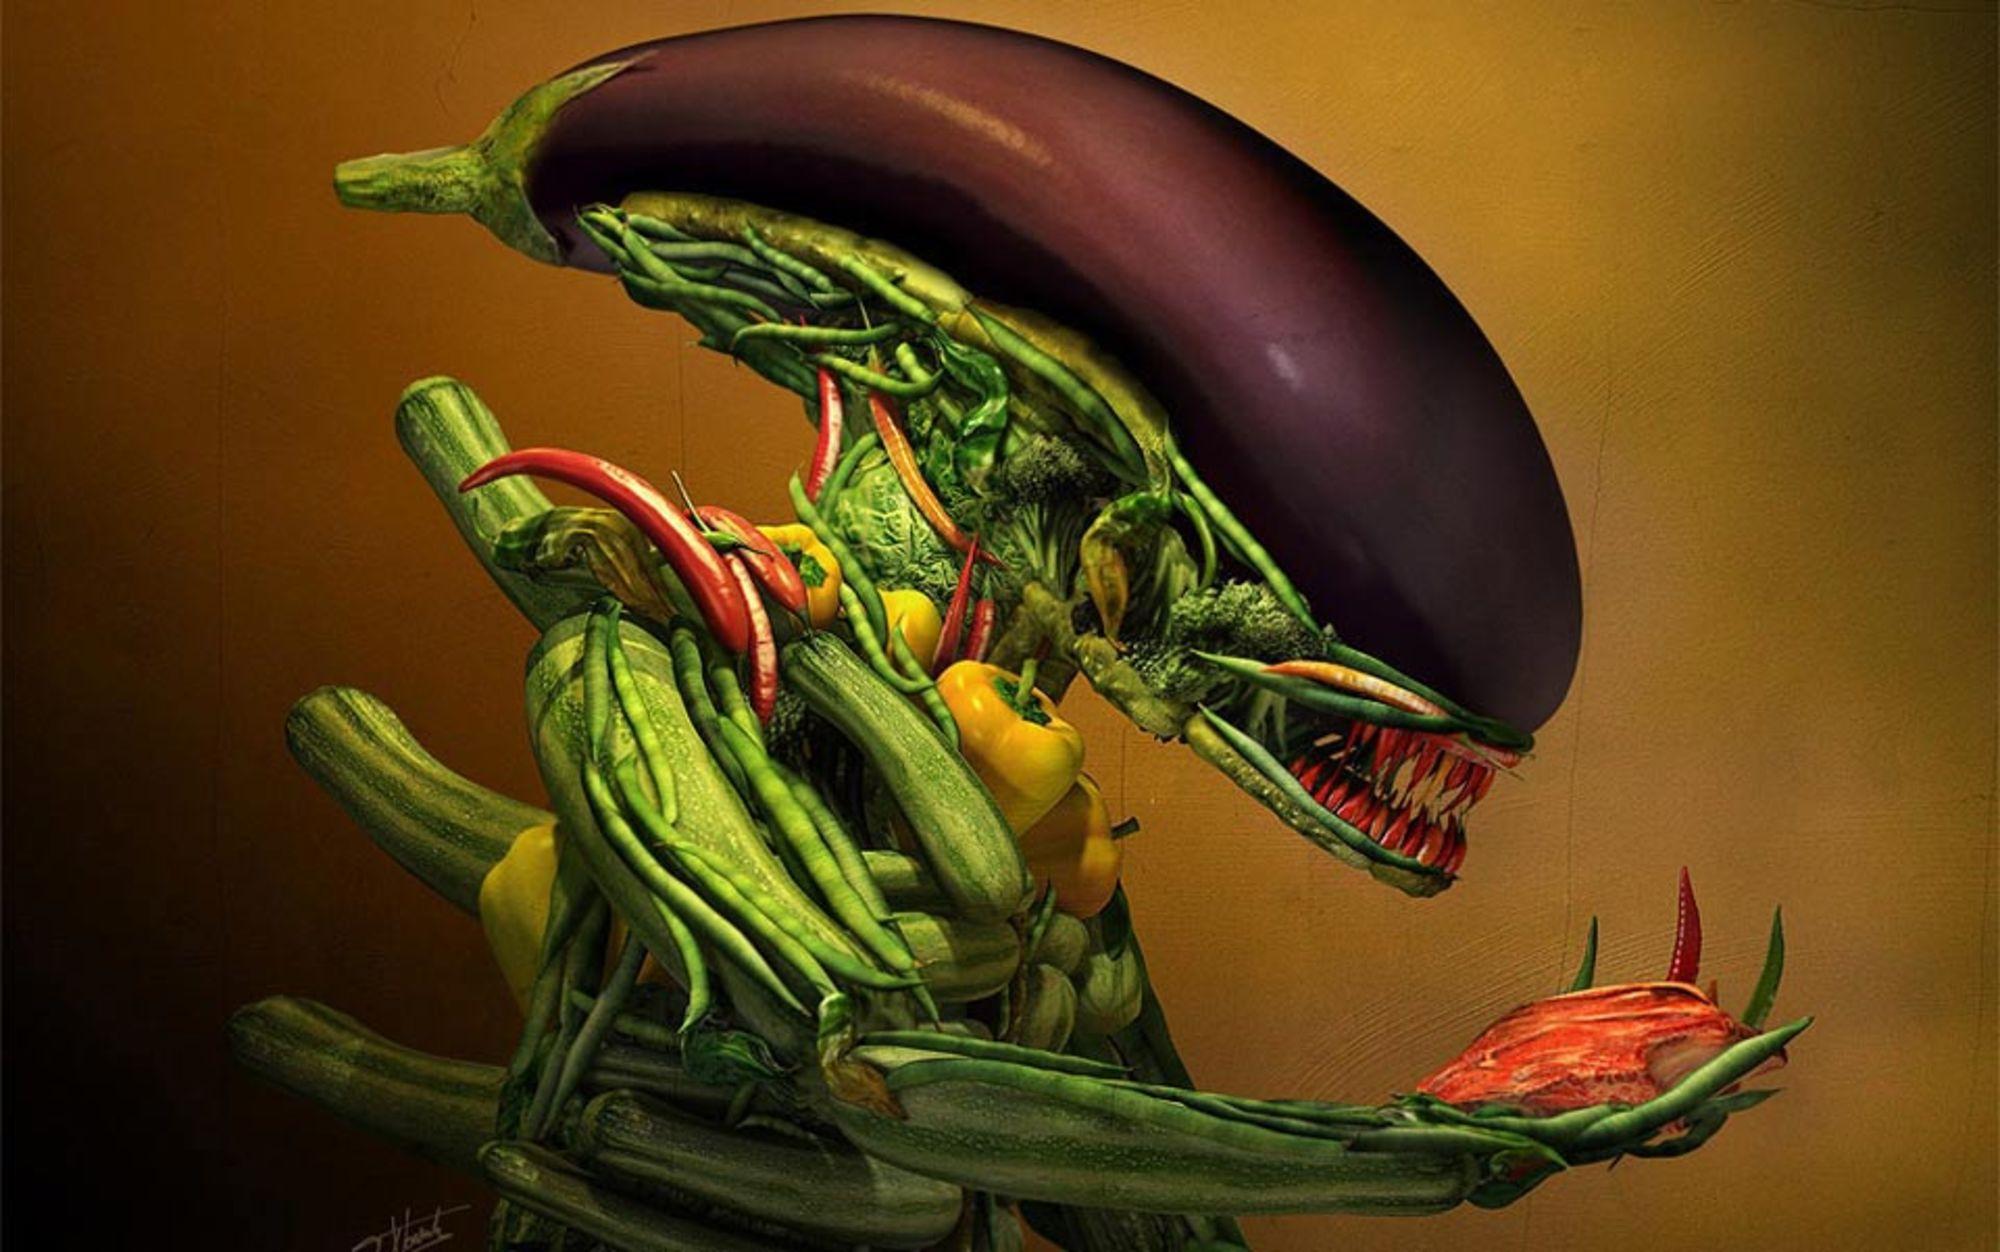 If aliens treated us like vegans treat animals, we'd be ...